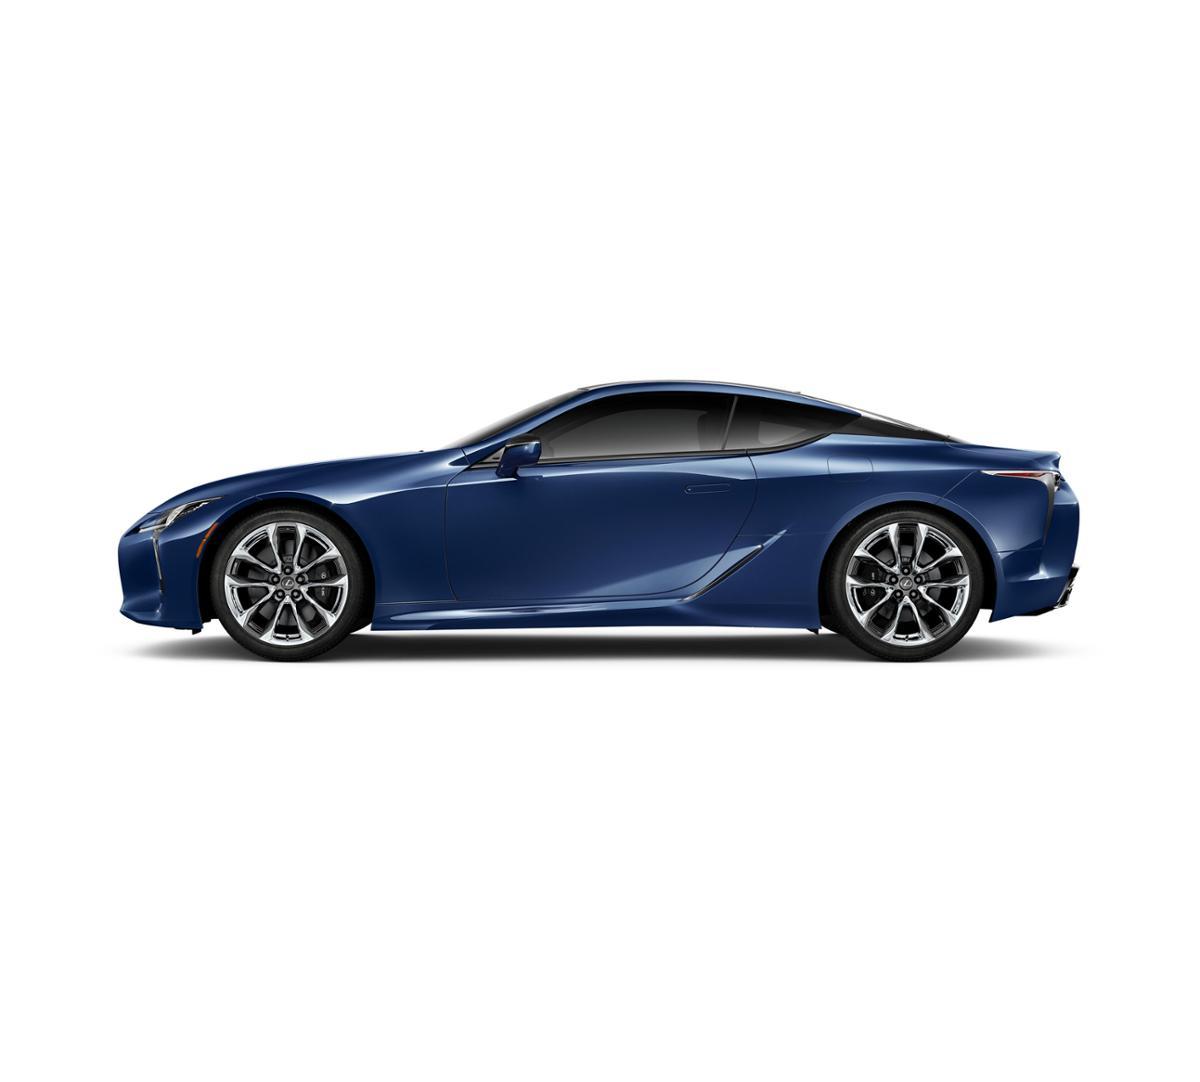 Dallas New 2018 Lexus LC 500 Nightfall Mica: Car For Sale